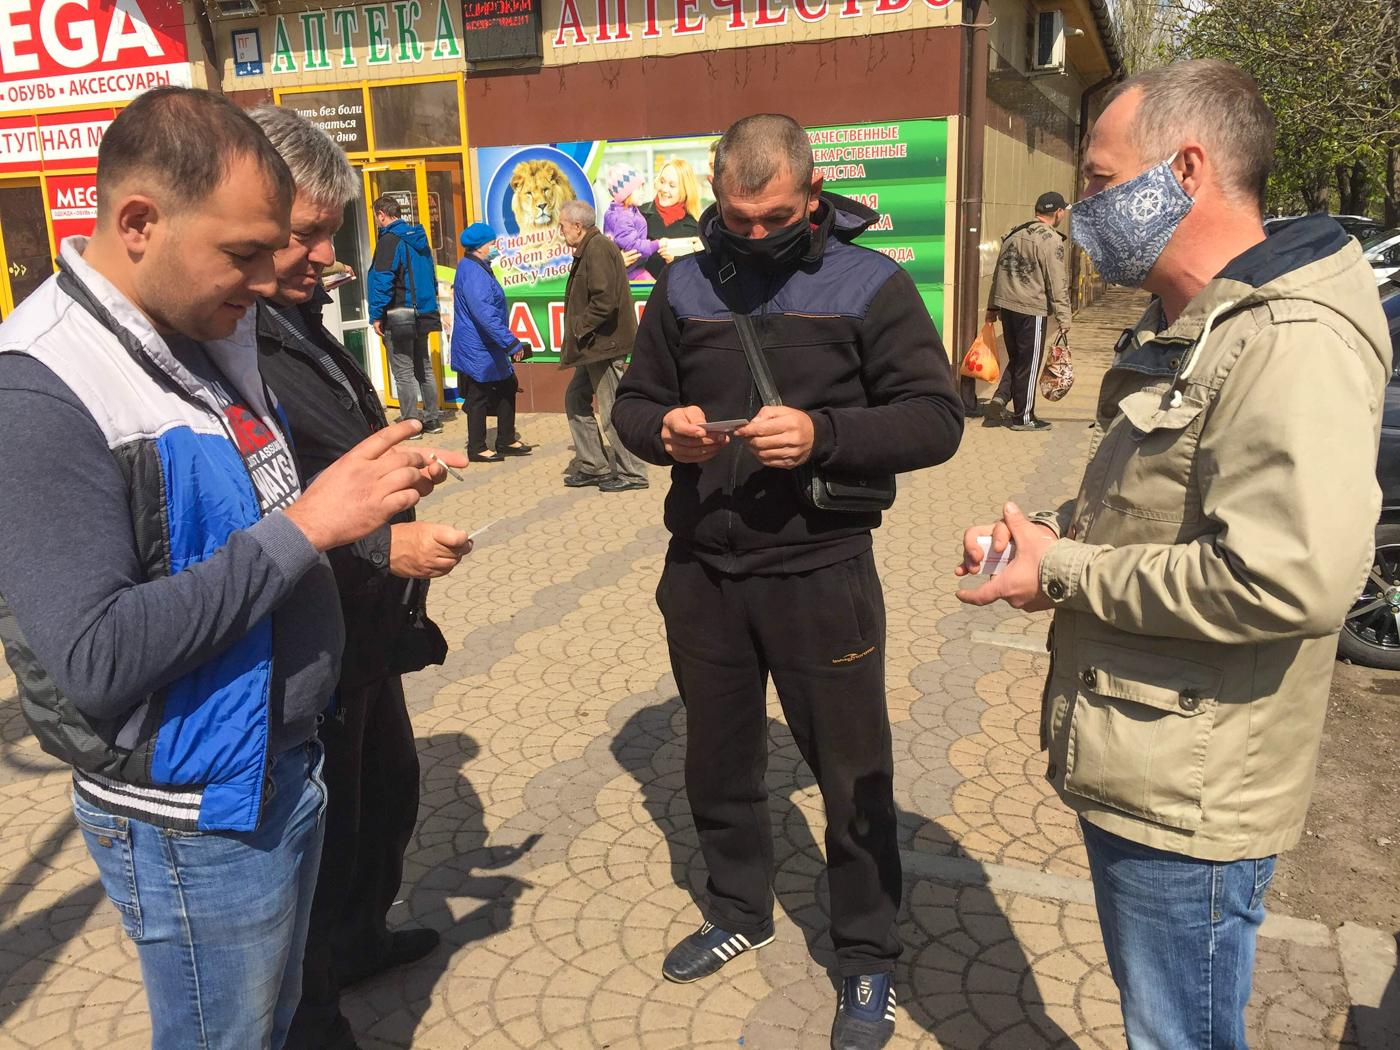 В Лутугино раздали визитки с номерами телефонов горячих линий по борьбе с наркотиками 2